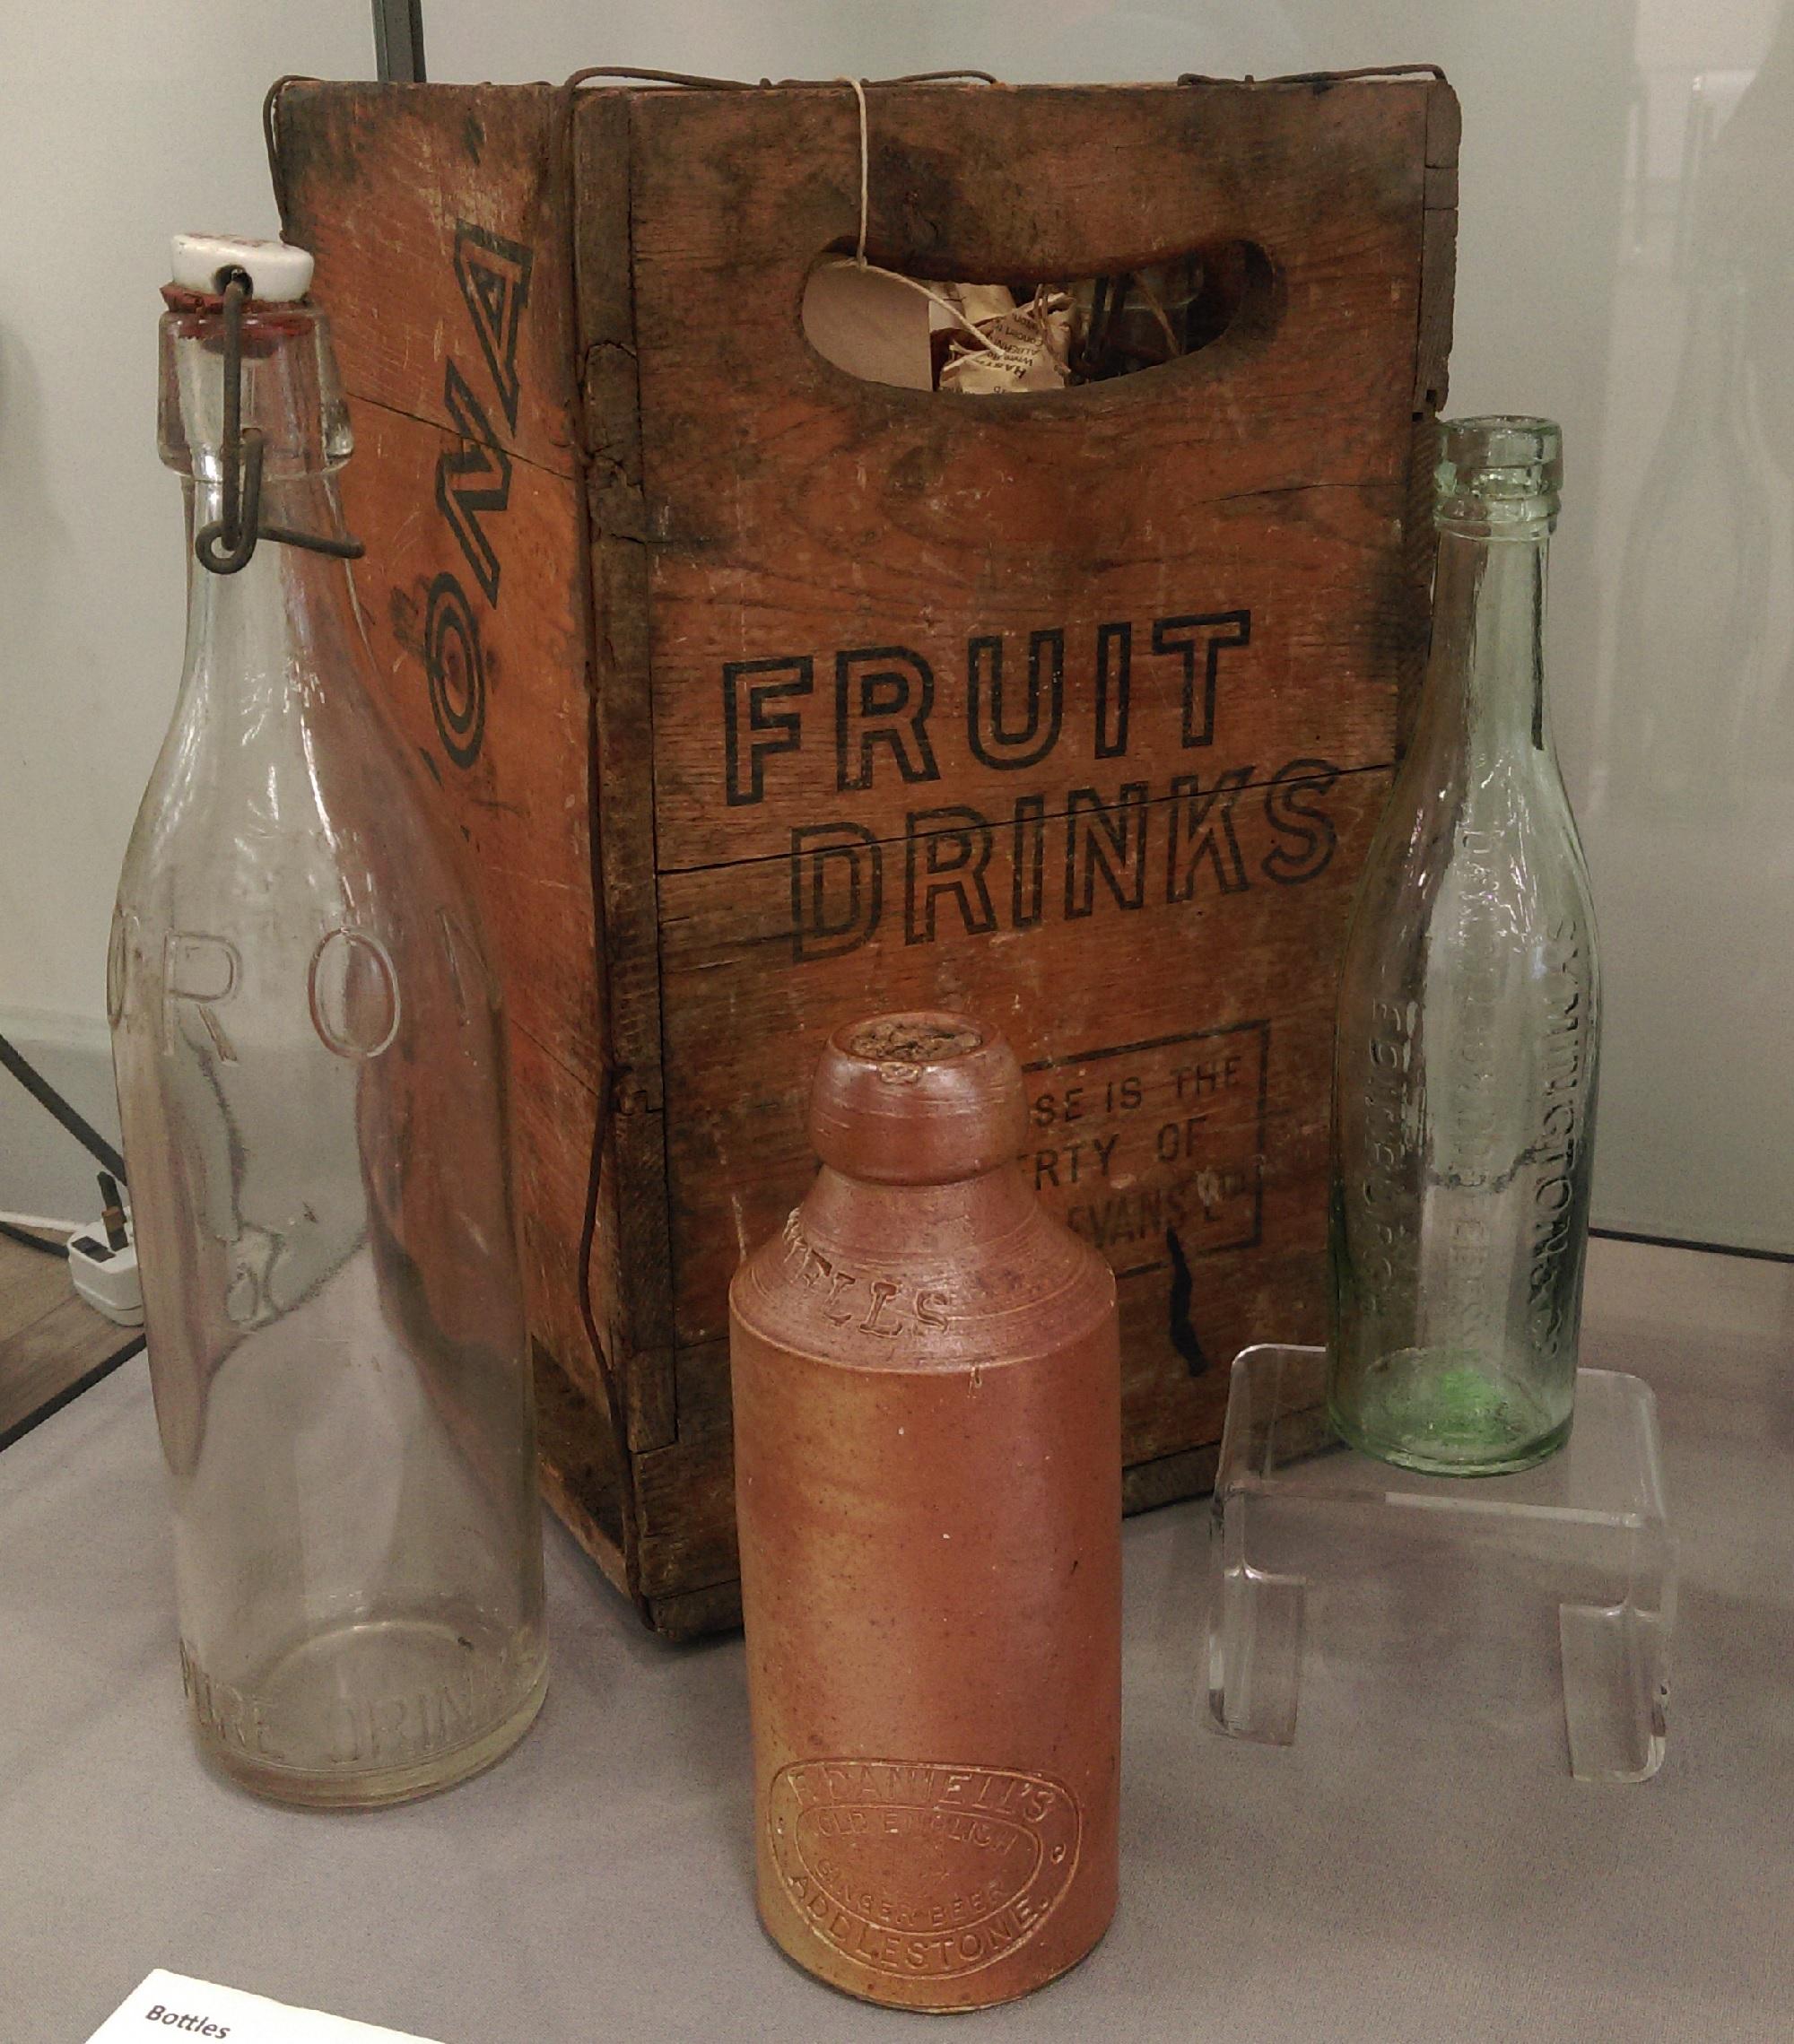 Box for 4 Corona bottles, with 'Corona' and